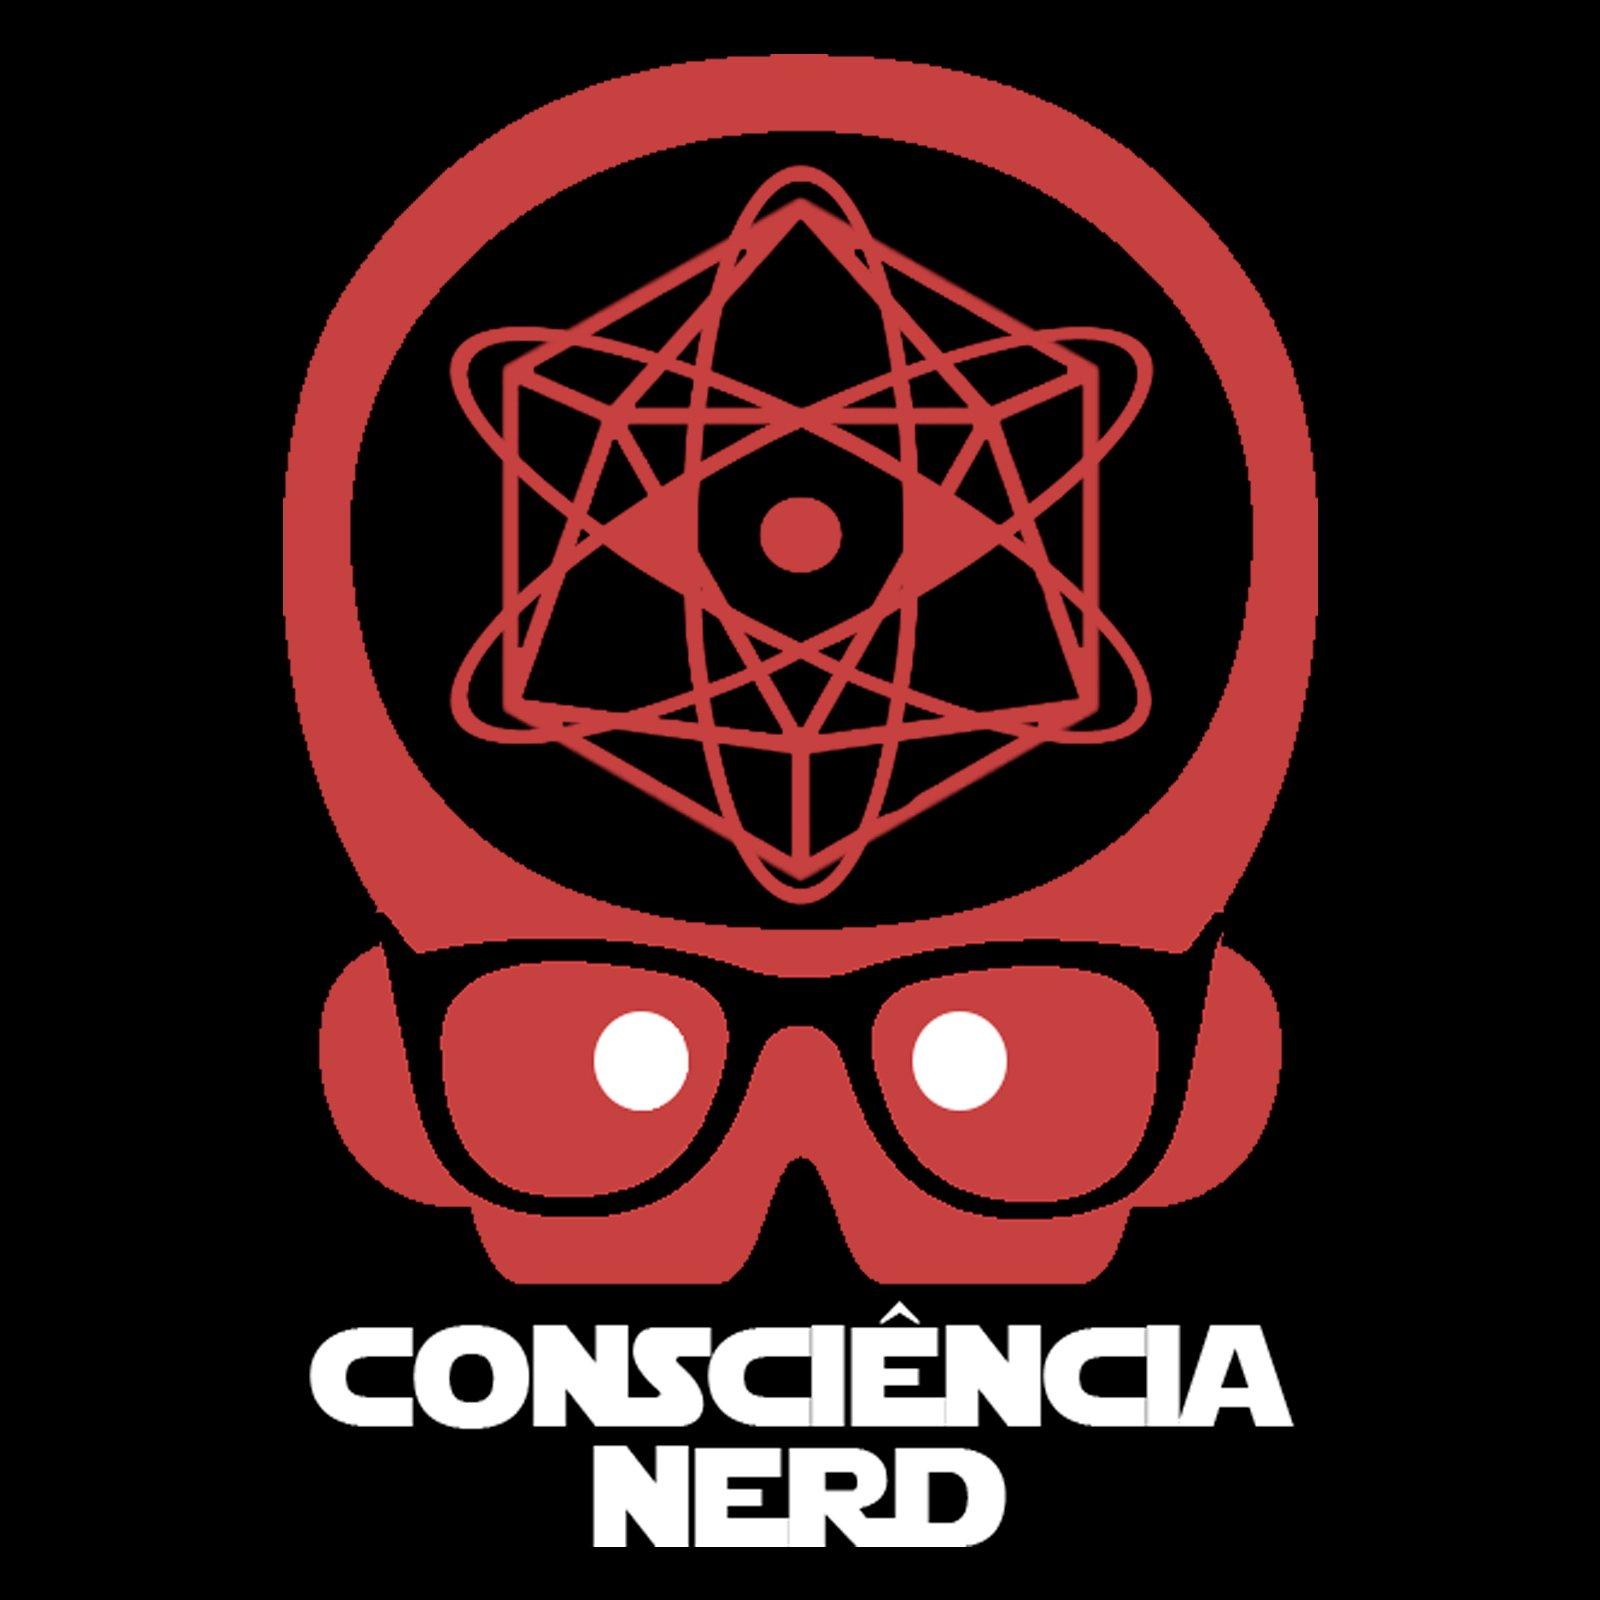 Consciência Nerd